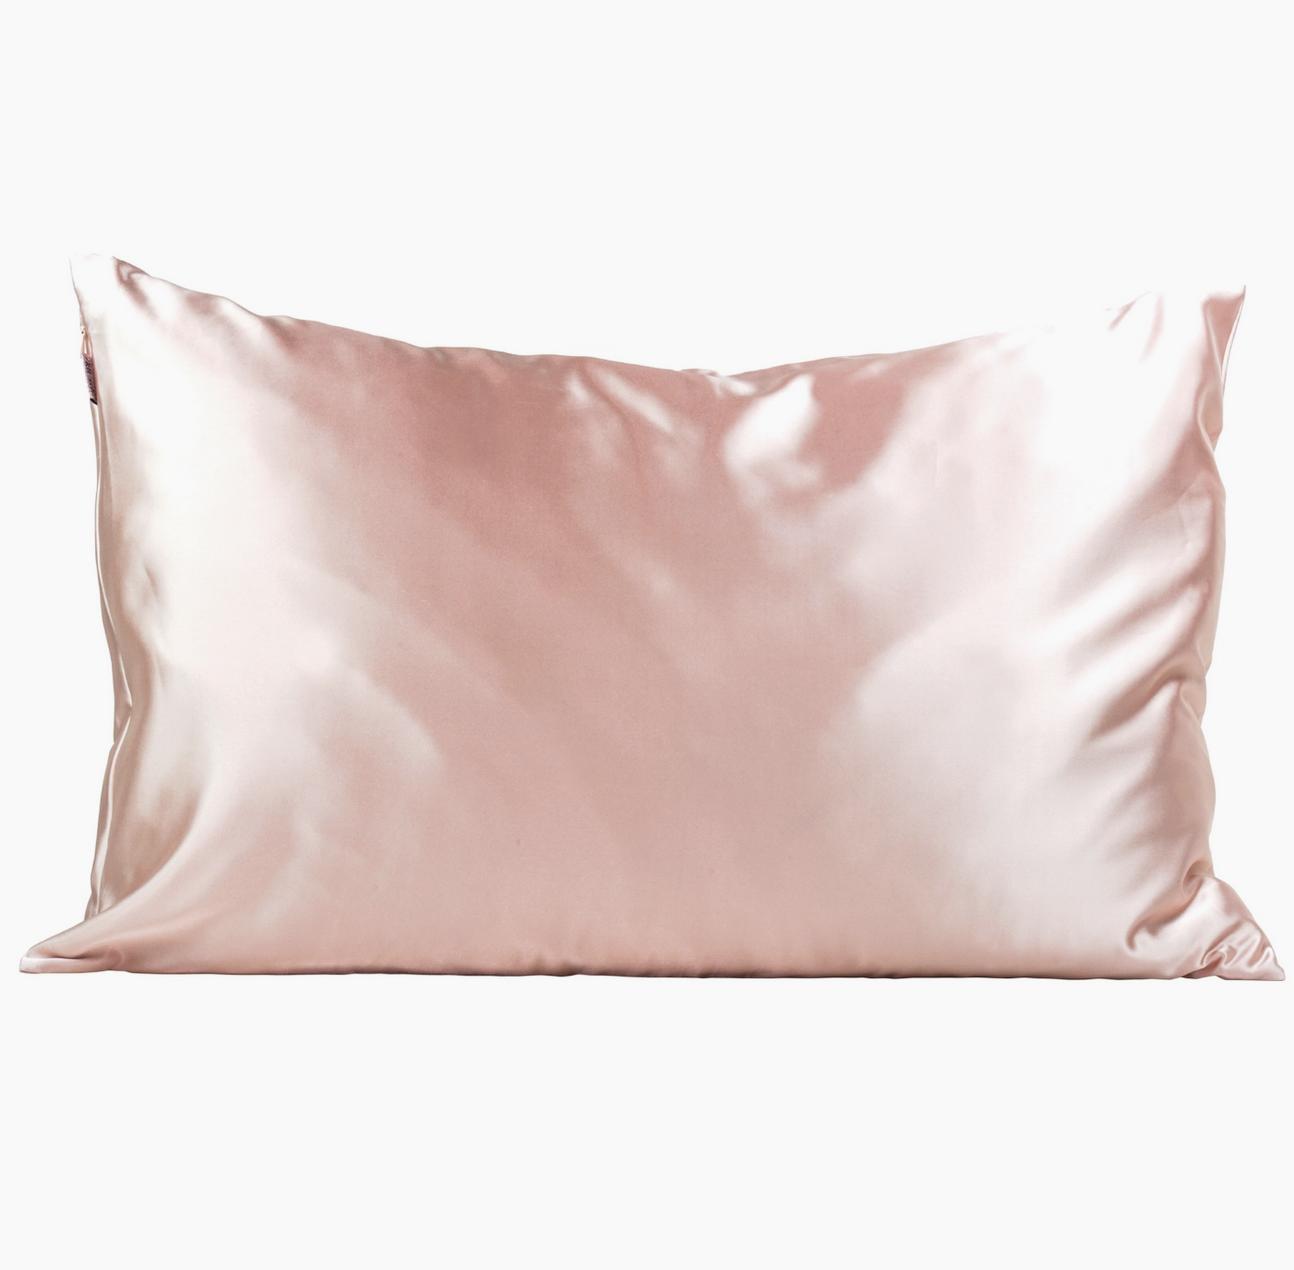 Kitsch Satin Pillowcase - Blush